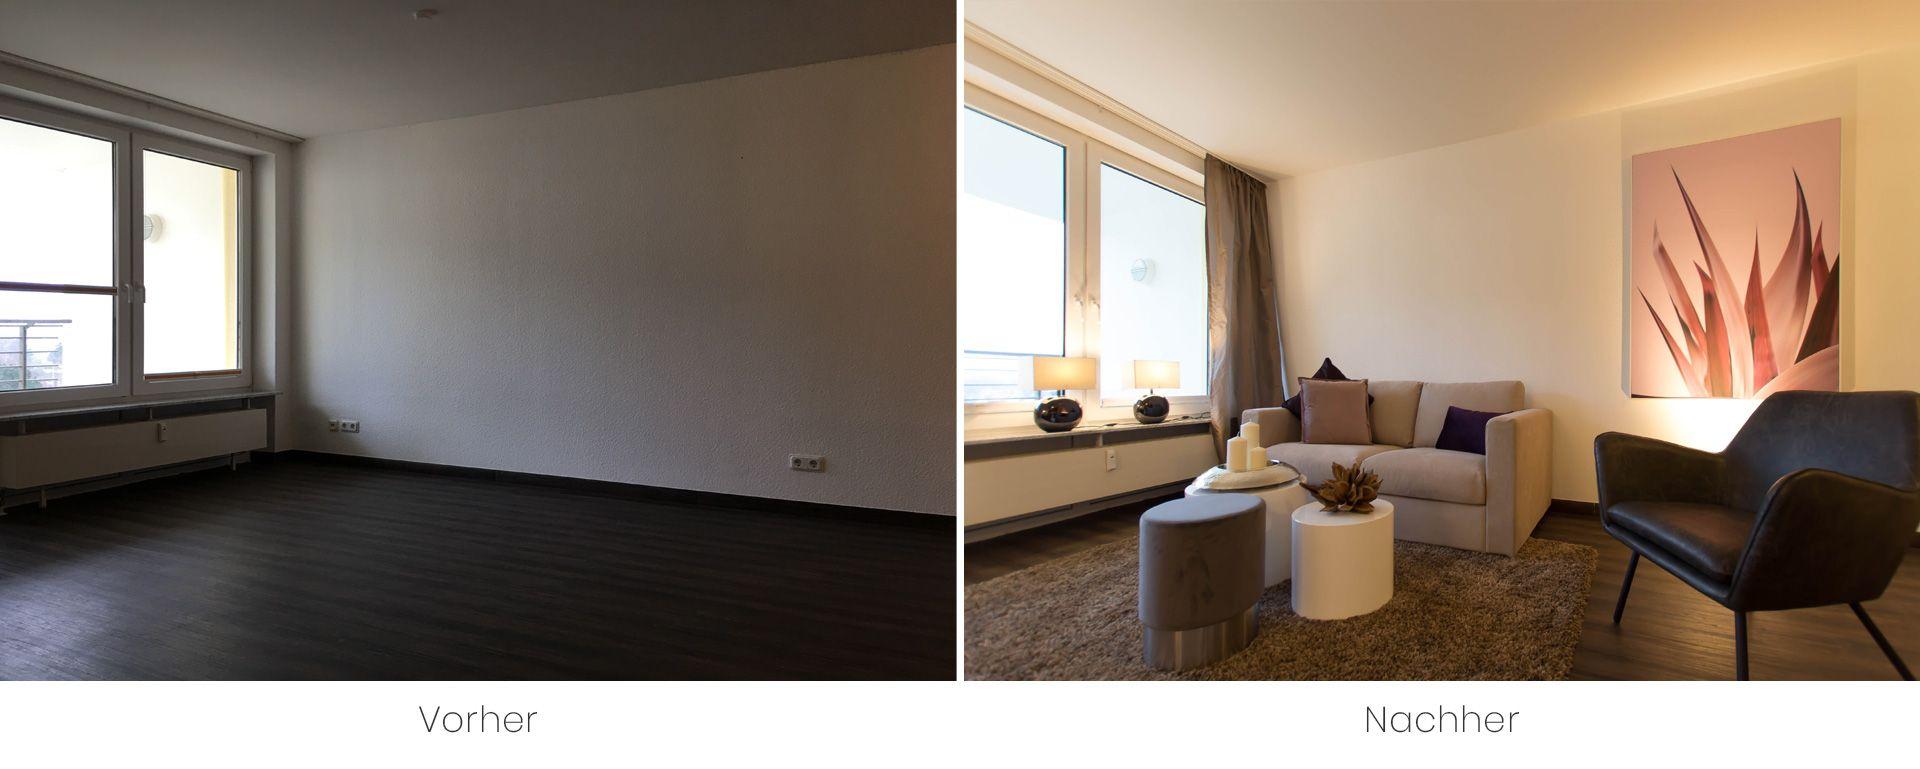 Home Staging Kurpark-Residenz Cuxhaven Bremen Hamburg JIL KOPERSCHMIDT IMMOBILIEN